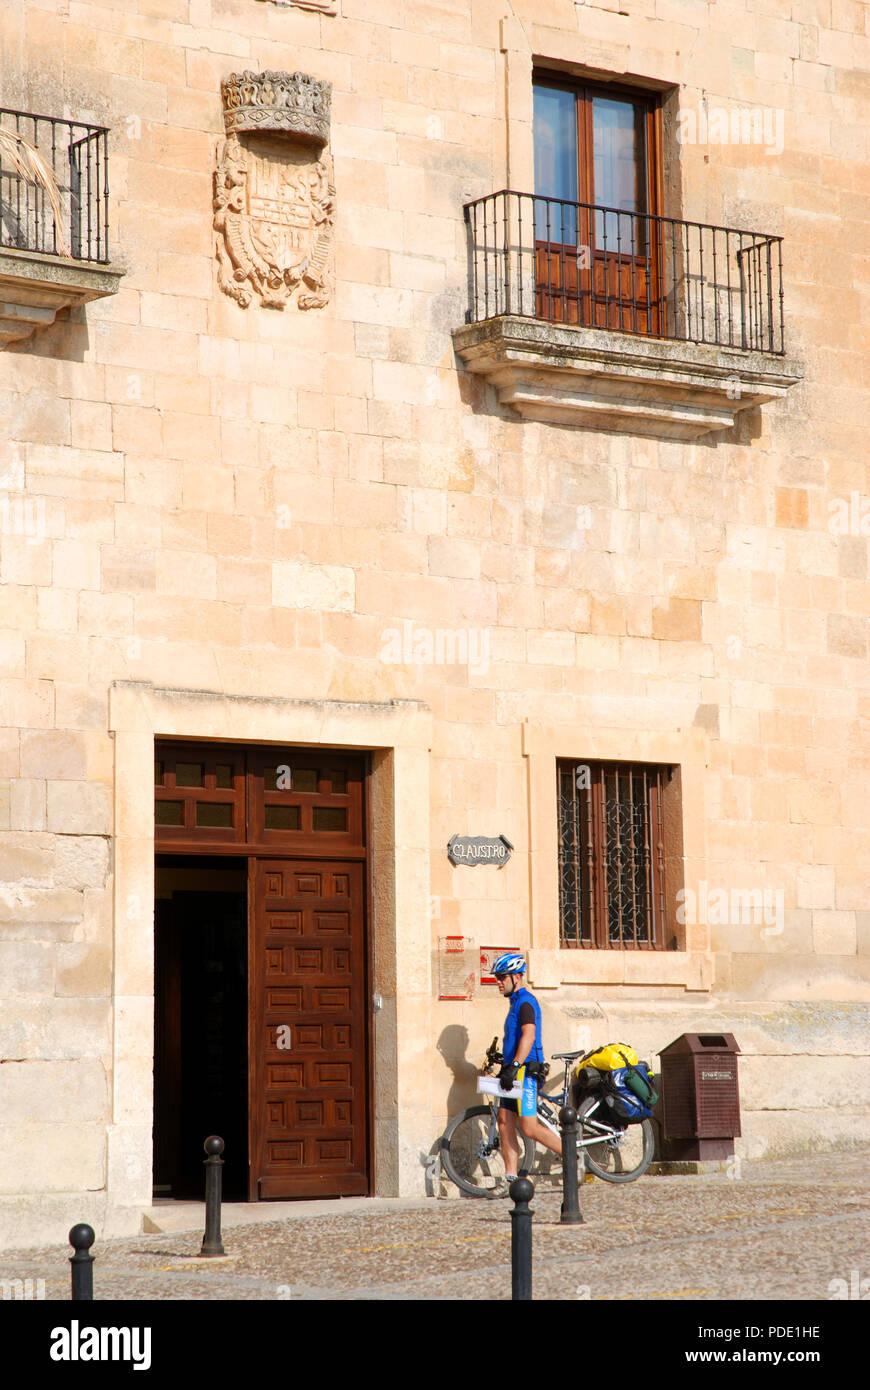 Pilgrim ciclist entering the monastery. Santo Domingo de Silos, Burgos province, Castilla Leon, Spain. - Stock Image